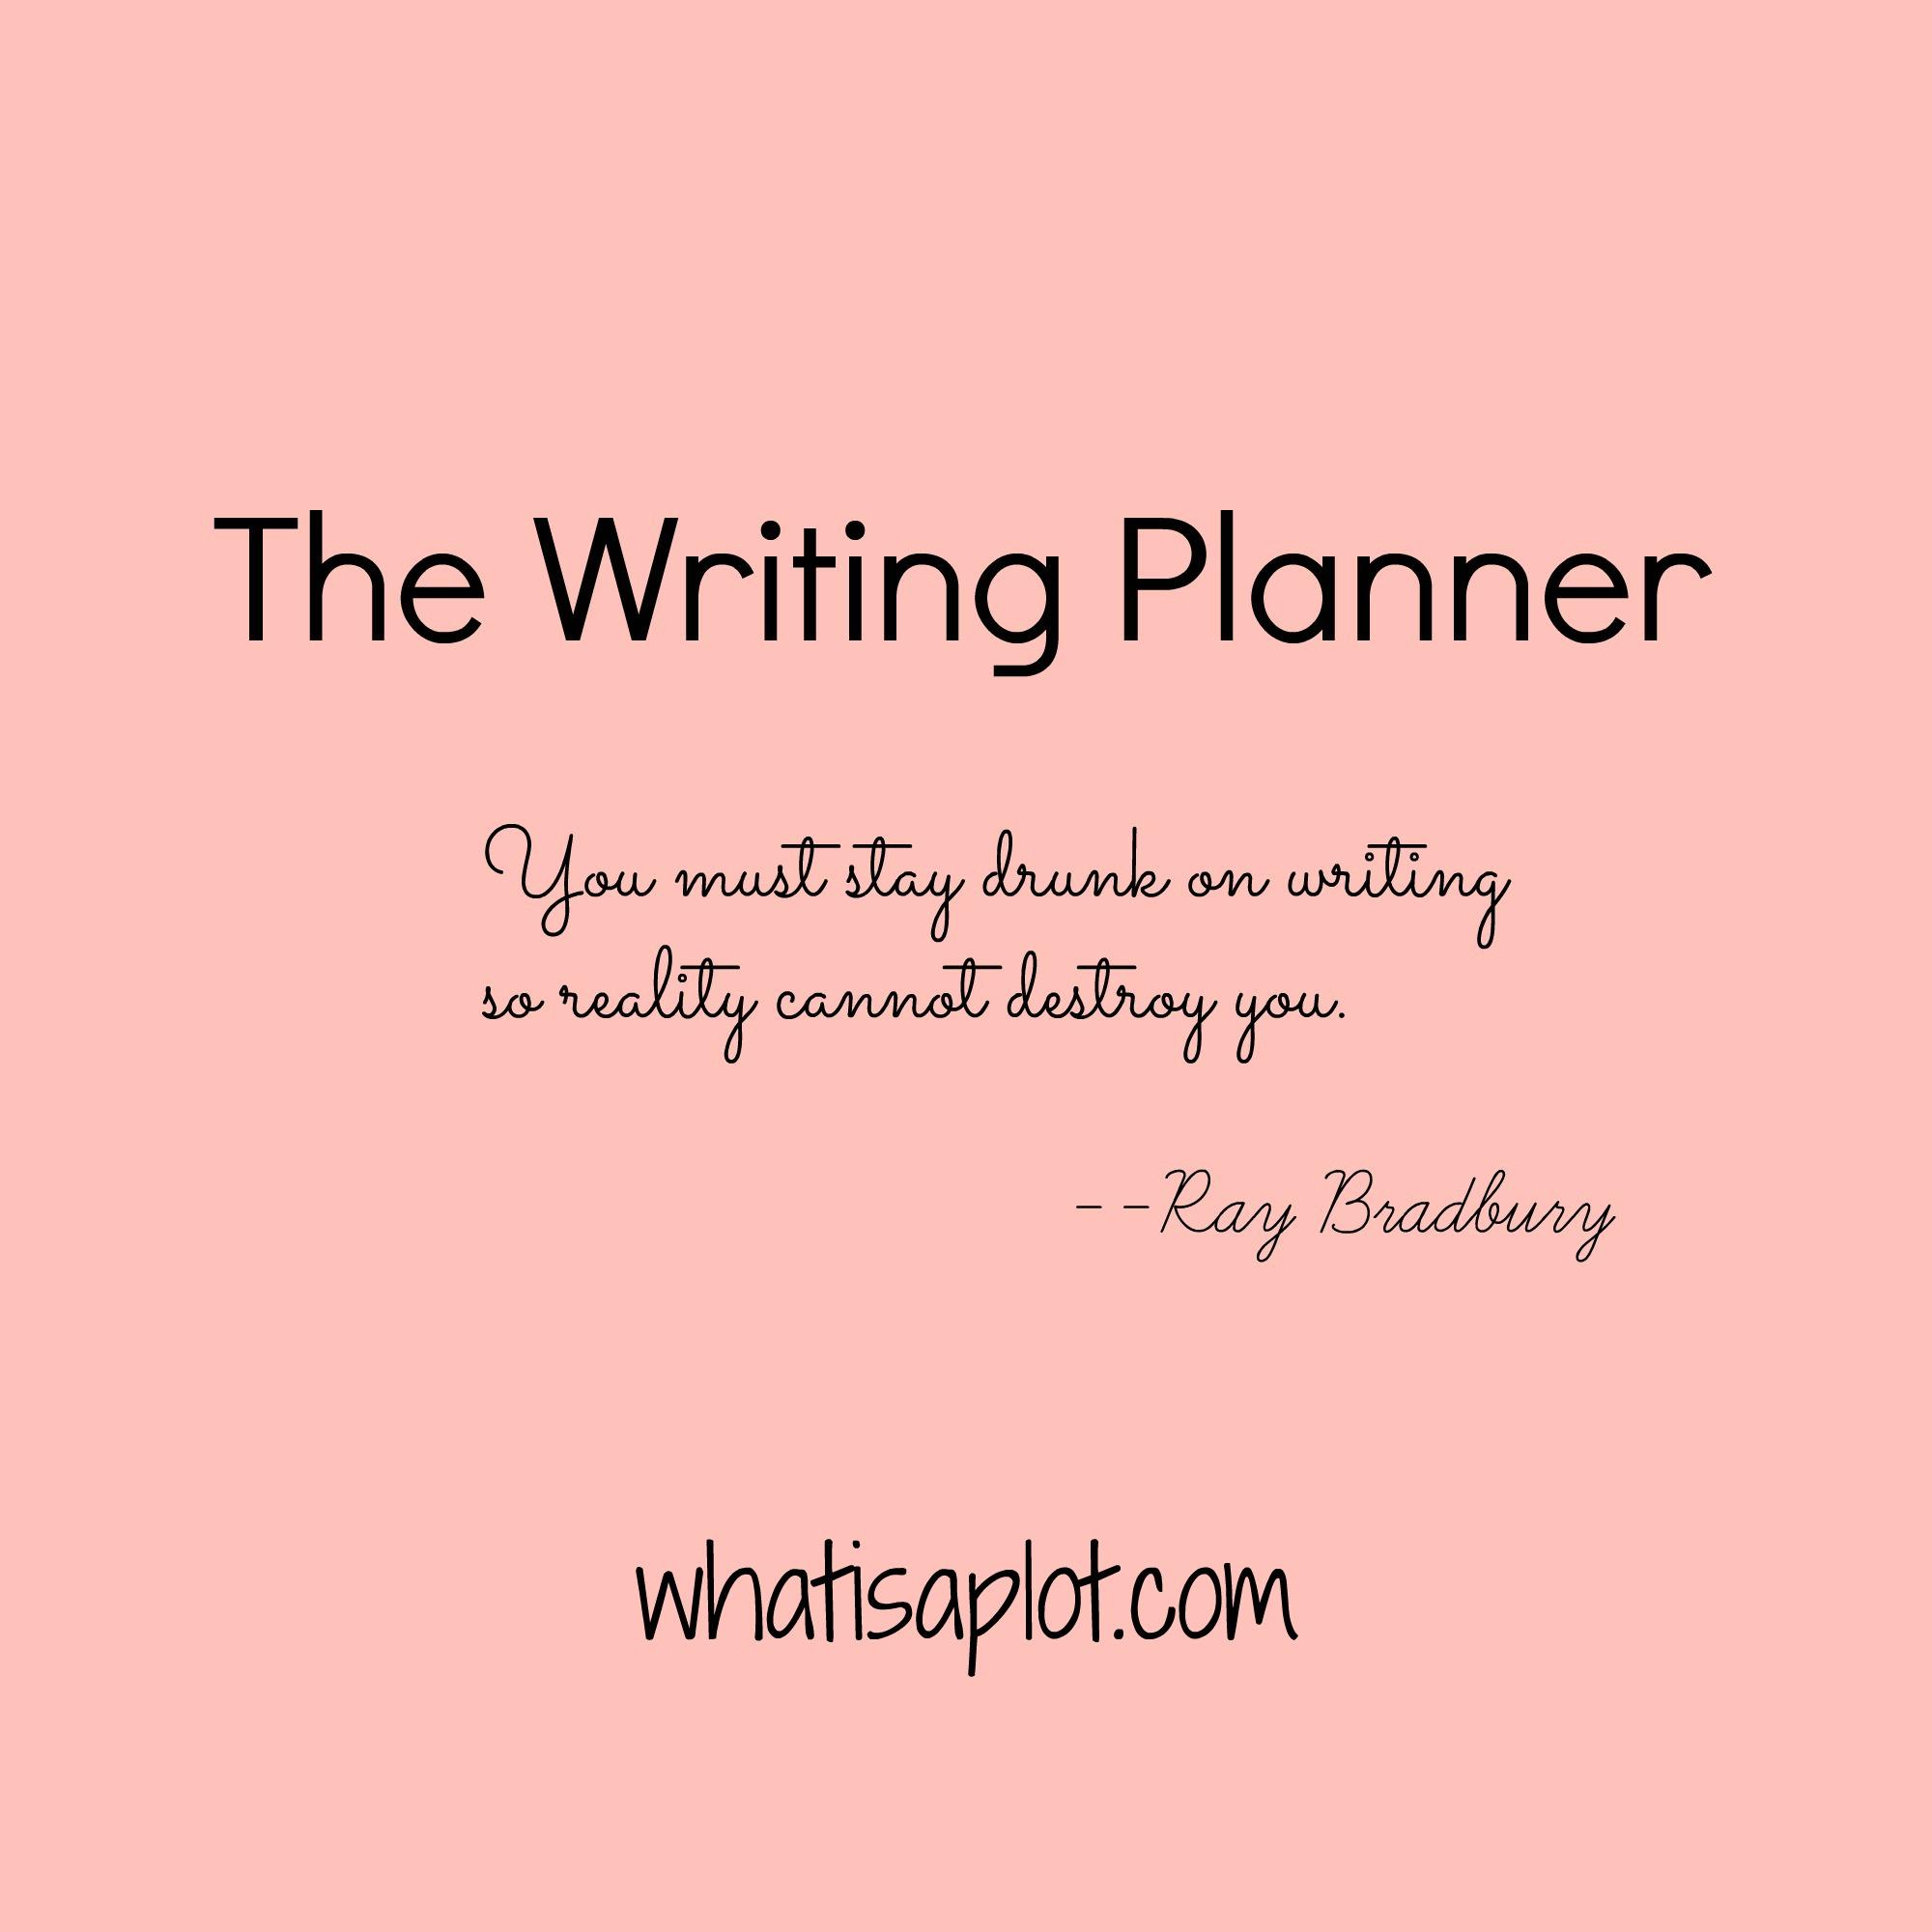 Meet The Writing Planner